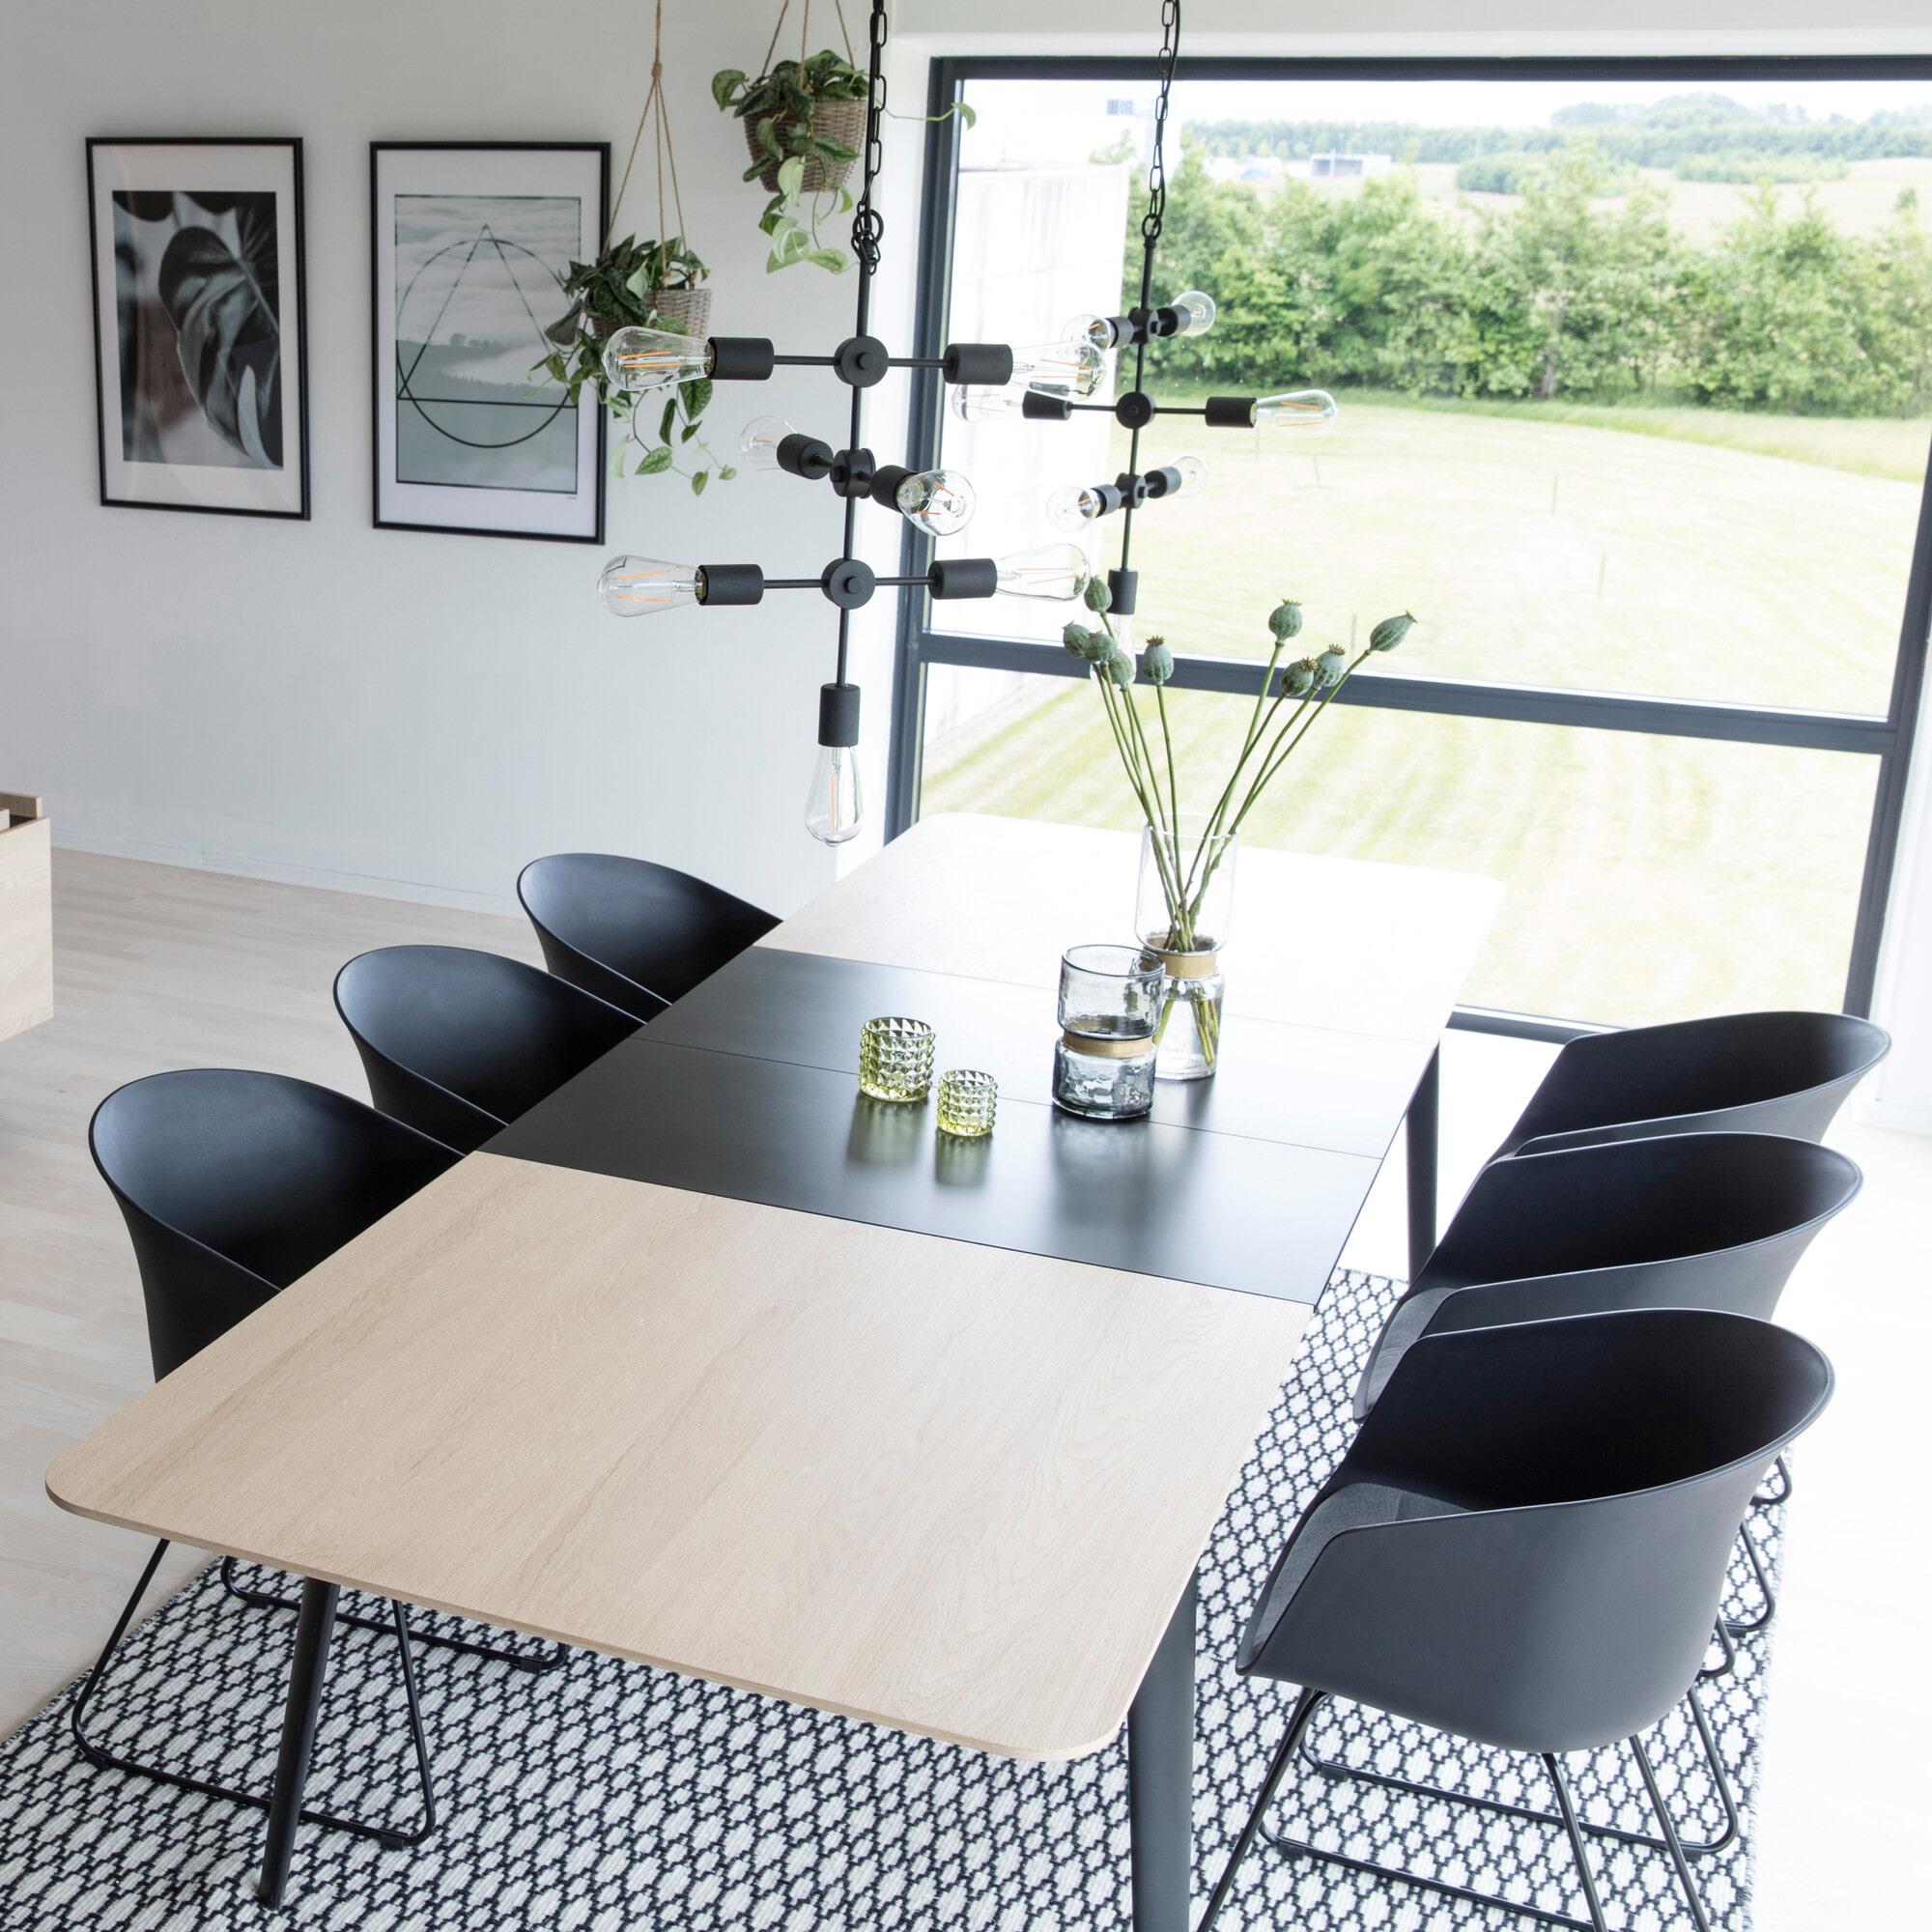 Interstil Eettafel 'Connect', 200 x 100cm incl 2 verlengbladen